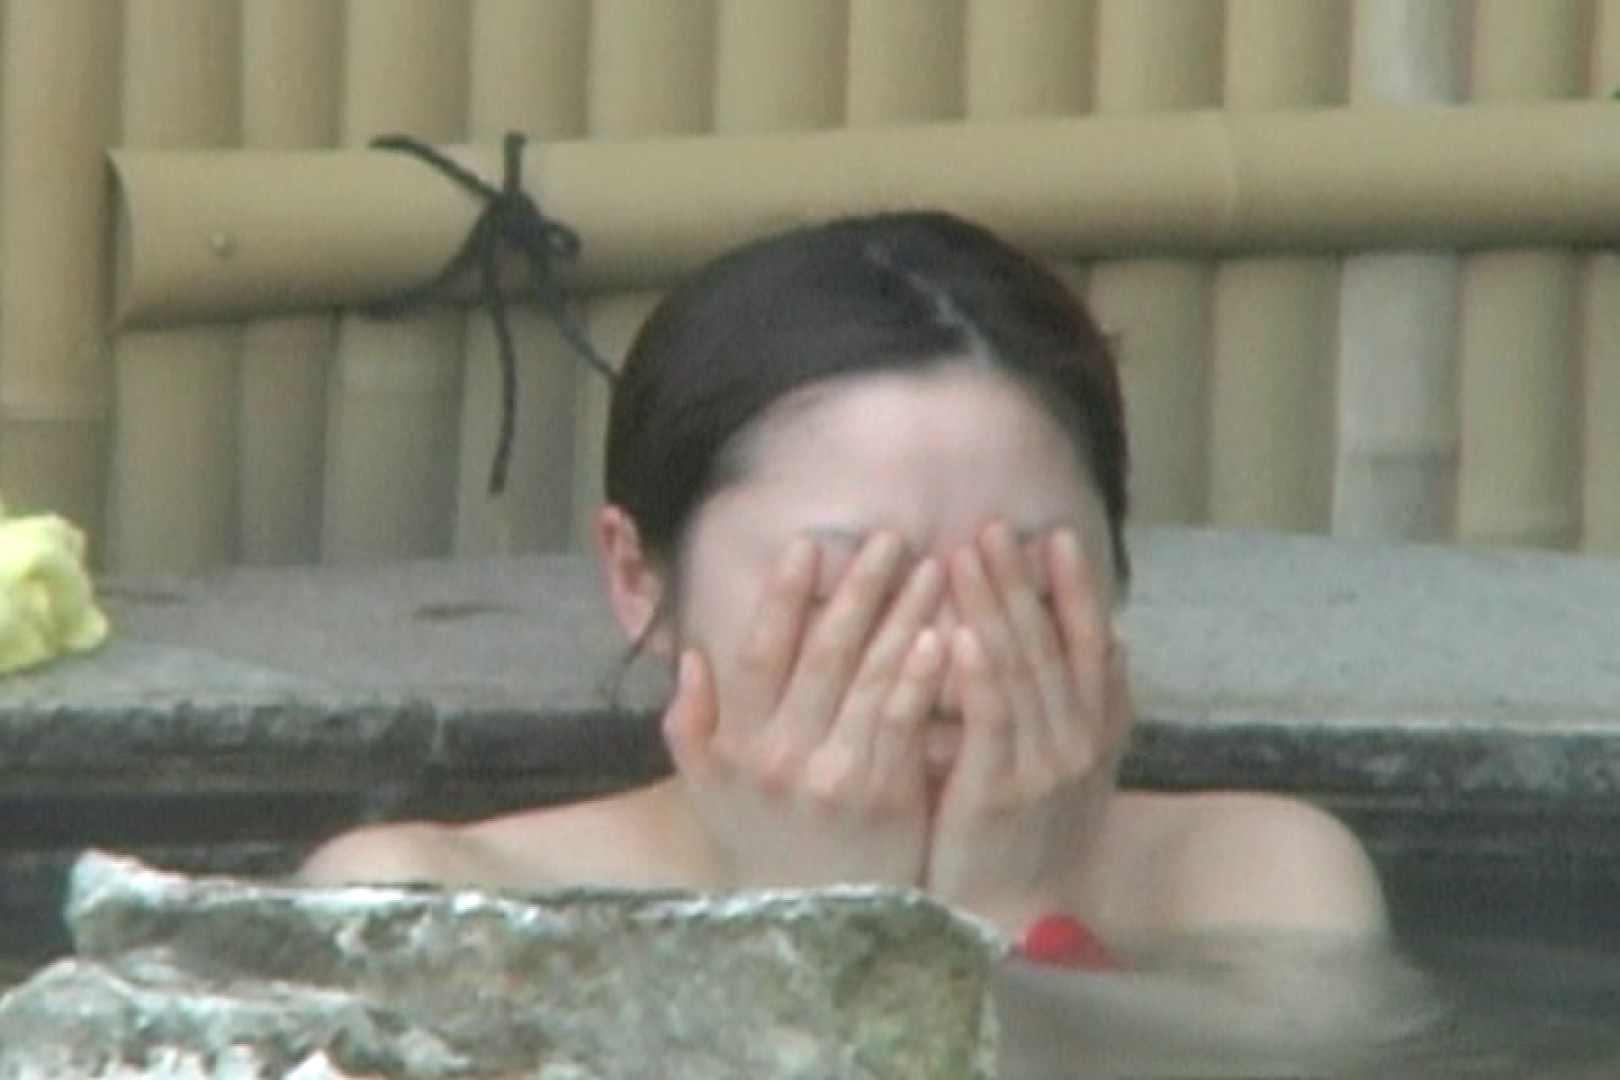 Aquaな露天風呂Vol.596 盗撮シリーズ | 露天風呂編  113PIX 101